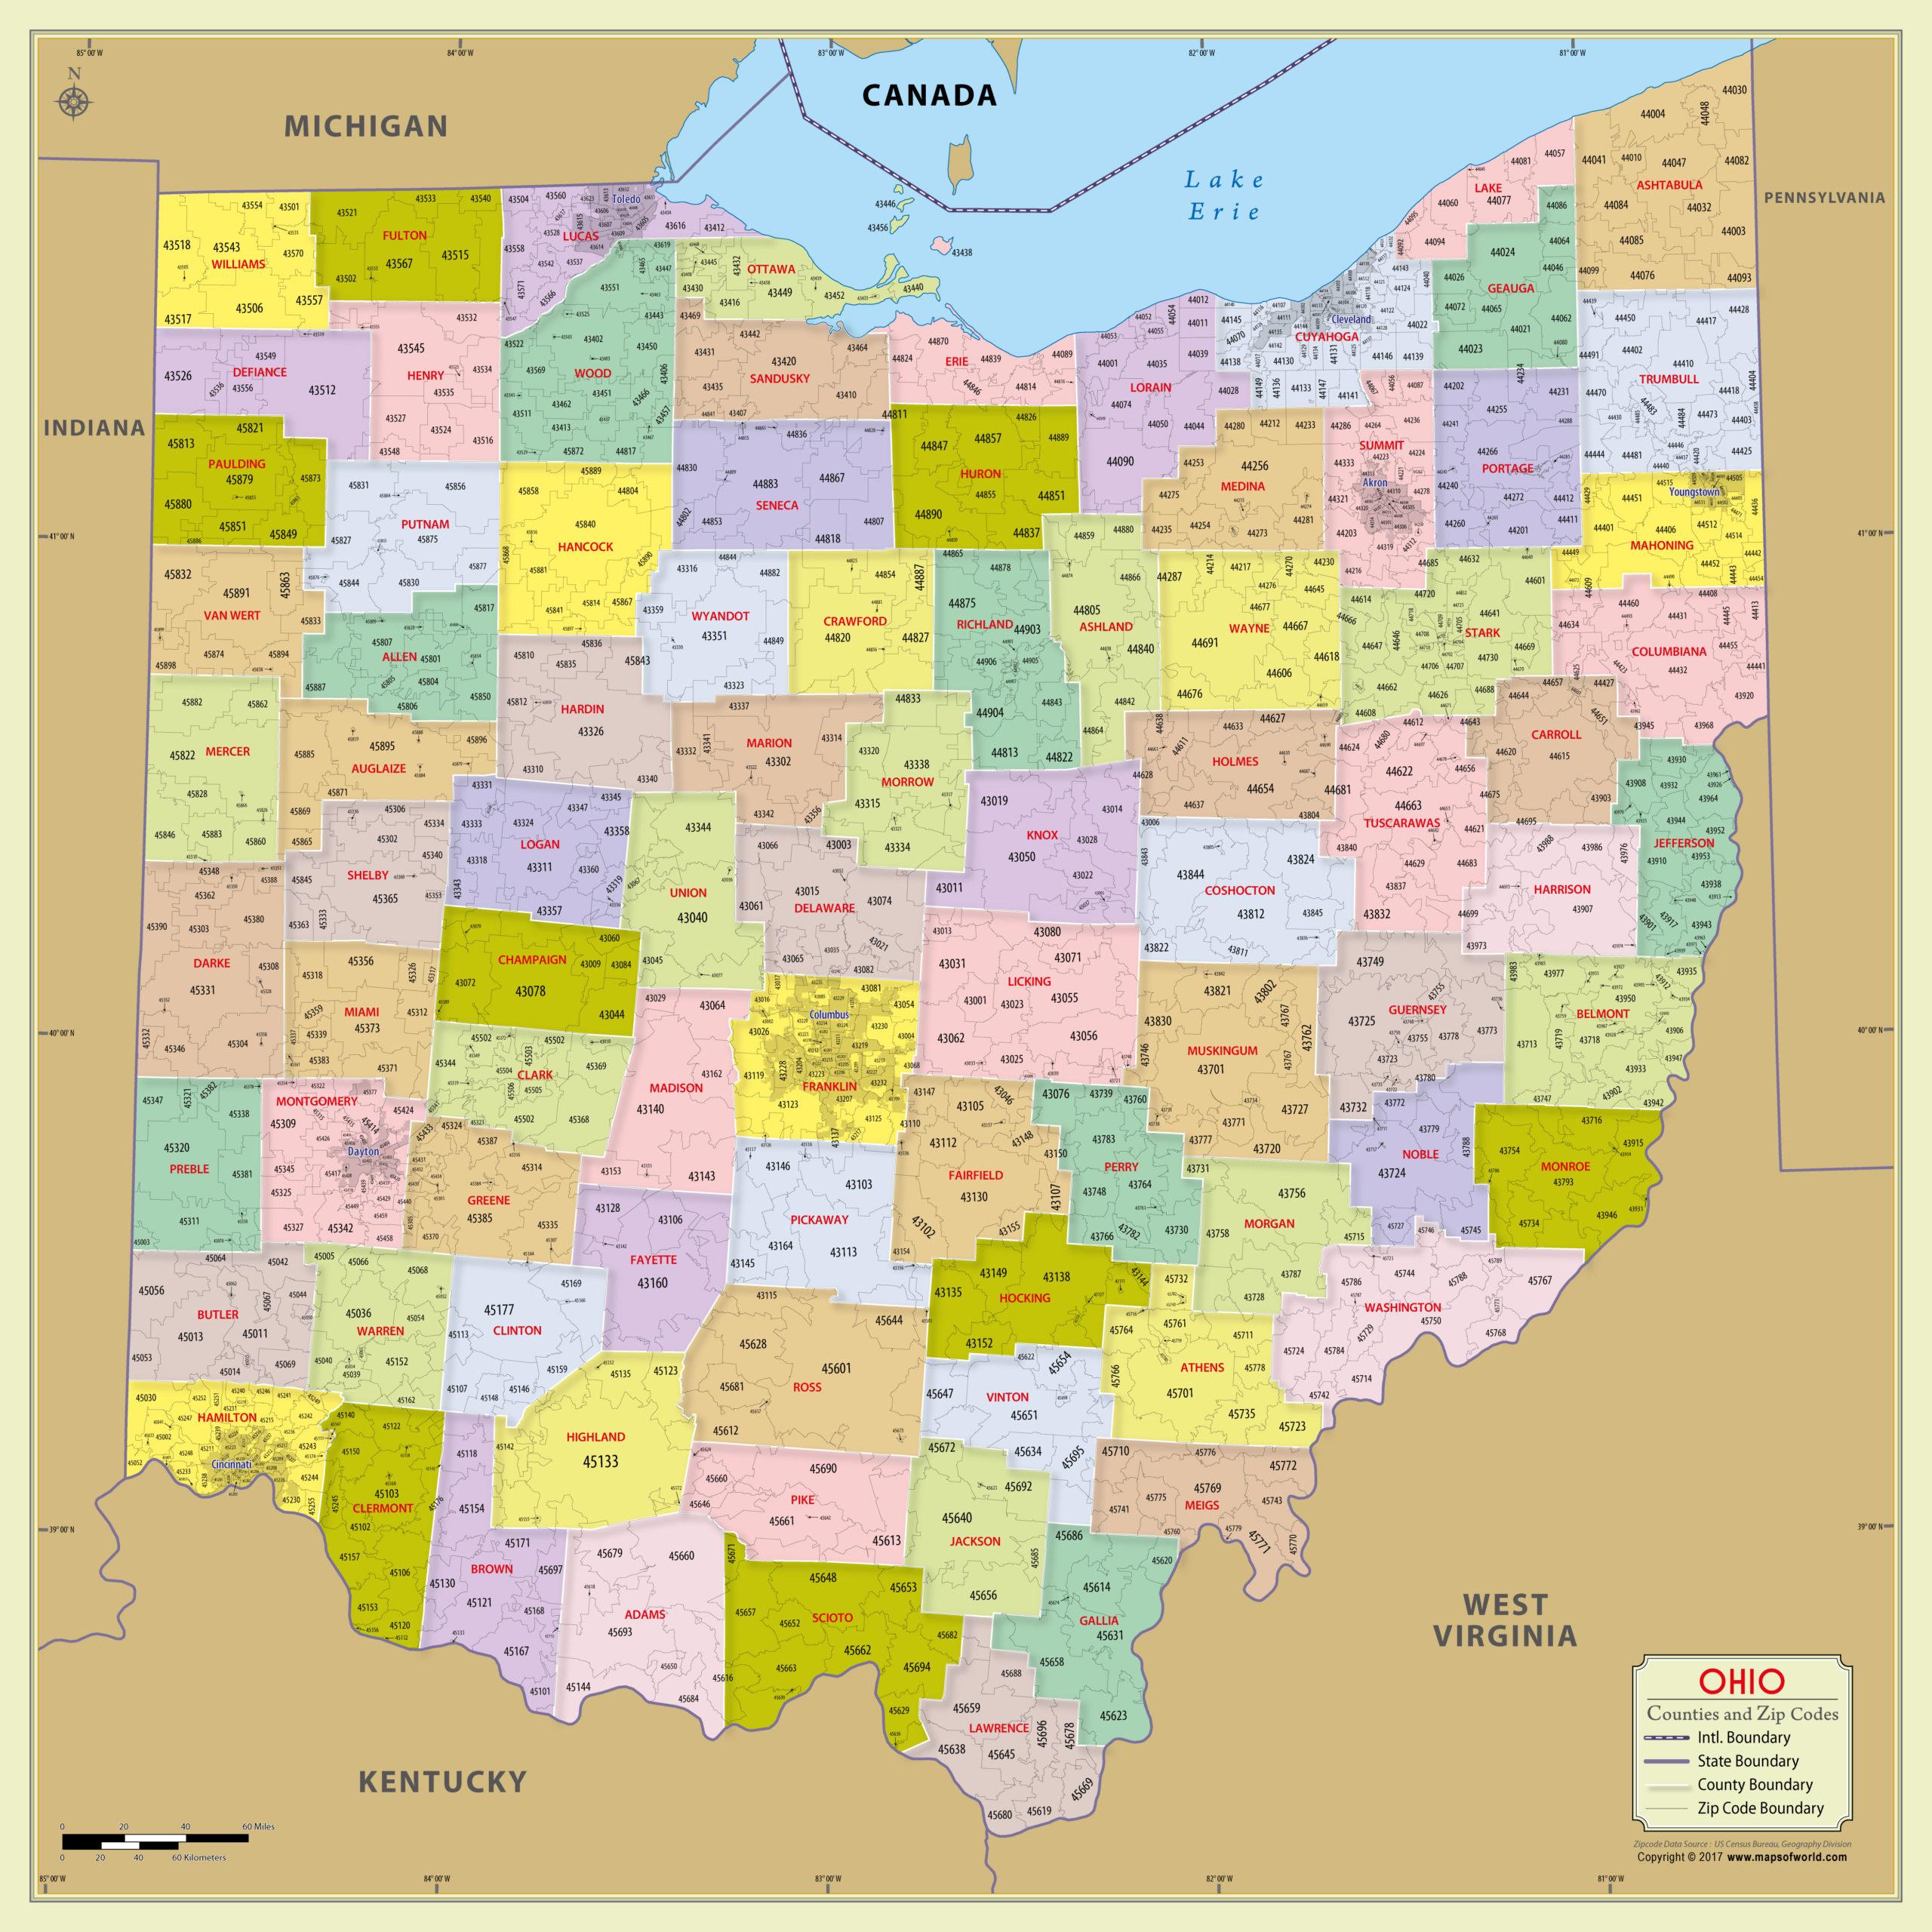 Buy Ohio Zip Code Map With Counties